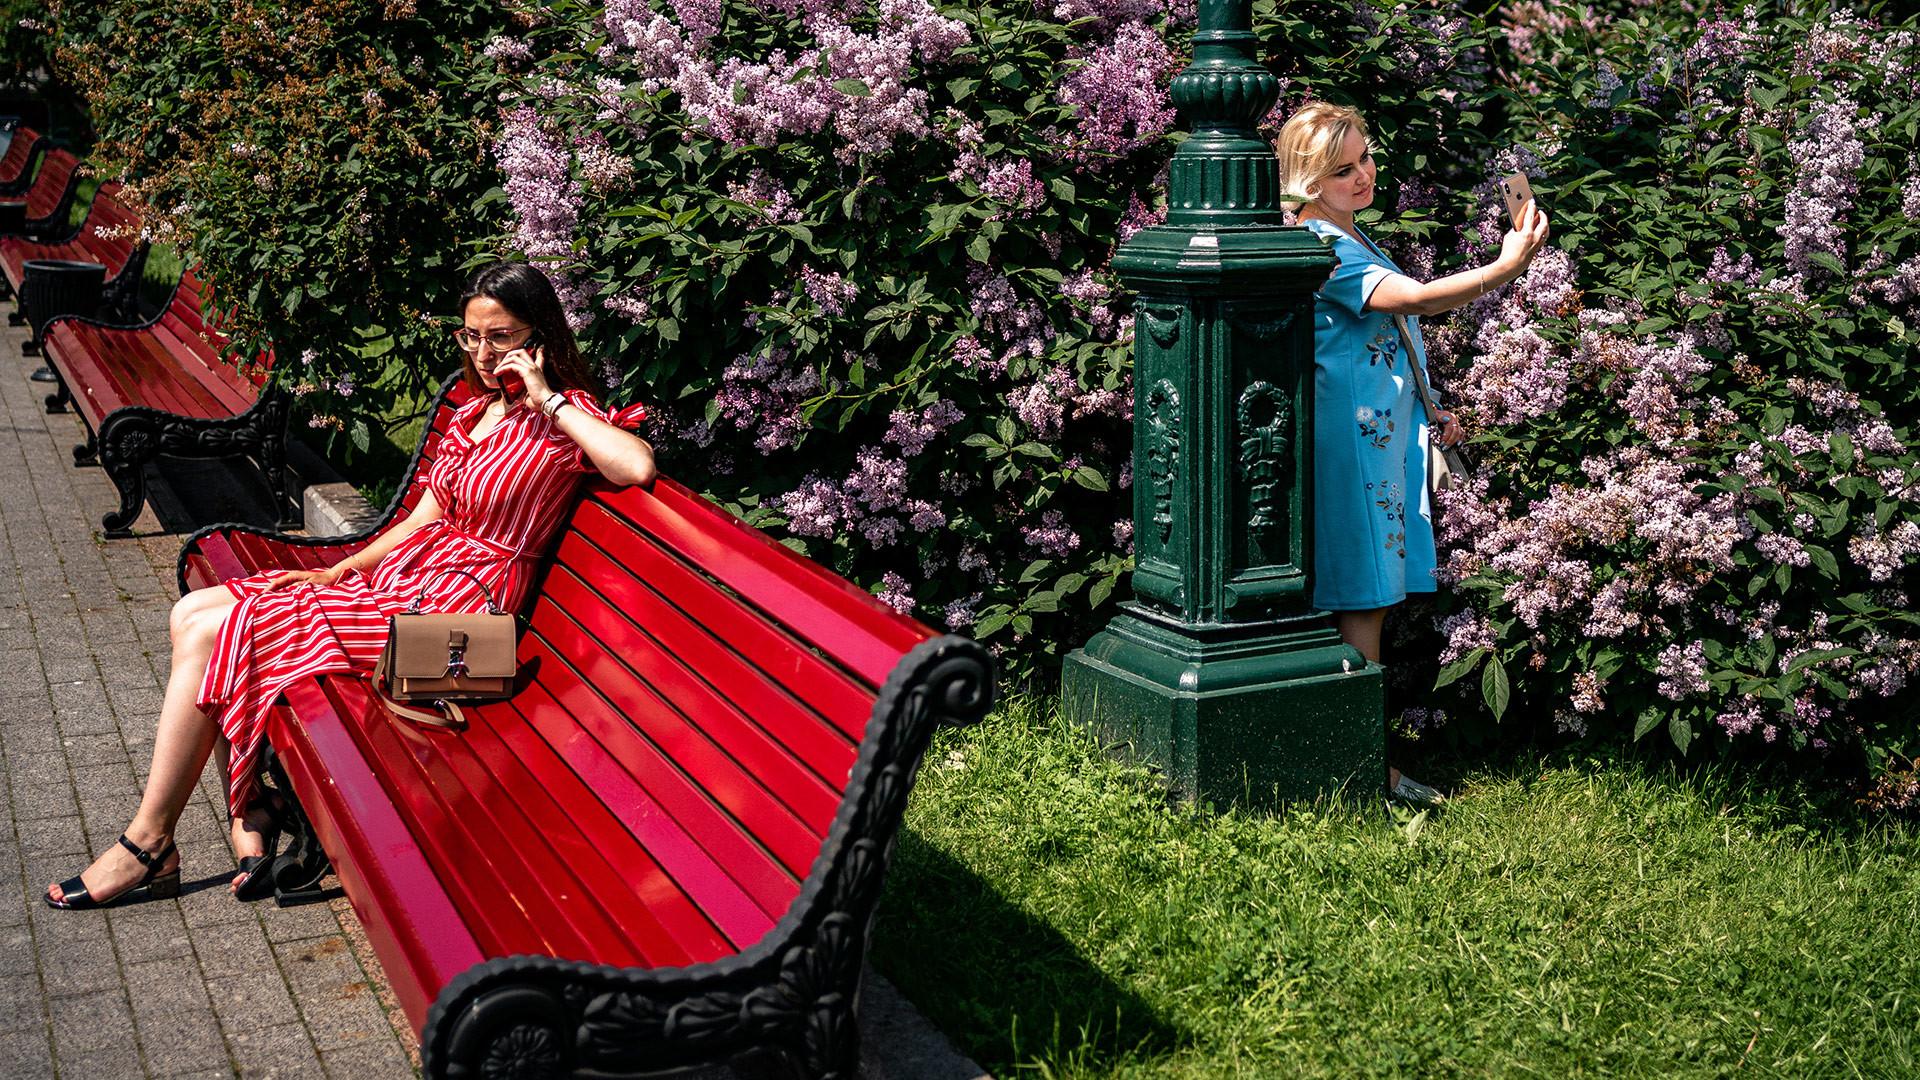 Para perempuan tampak menikmati hari yang hangat dan cerah di sebuah taman di pusat kota, Selasa (9/6), pada hari pertama setelah Moskow mencabut aturan swakarantina demi memutus raiat penyebaran COVID-19 yang disebabkan virus corona.